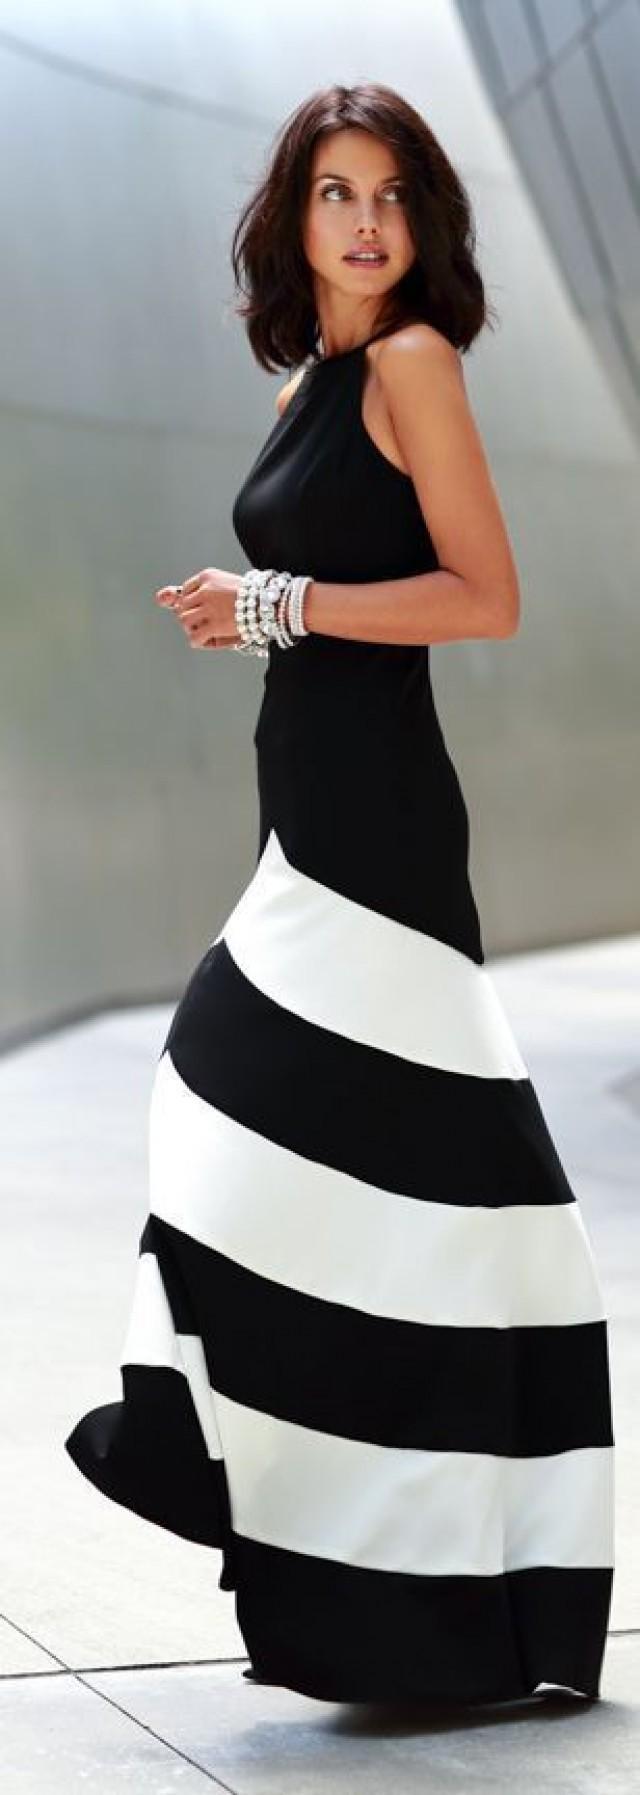 4b3a90f01d0a Black White Chiffon Stripe Sleeveless Maxi Casual Dress #2497422 - Weddbook